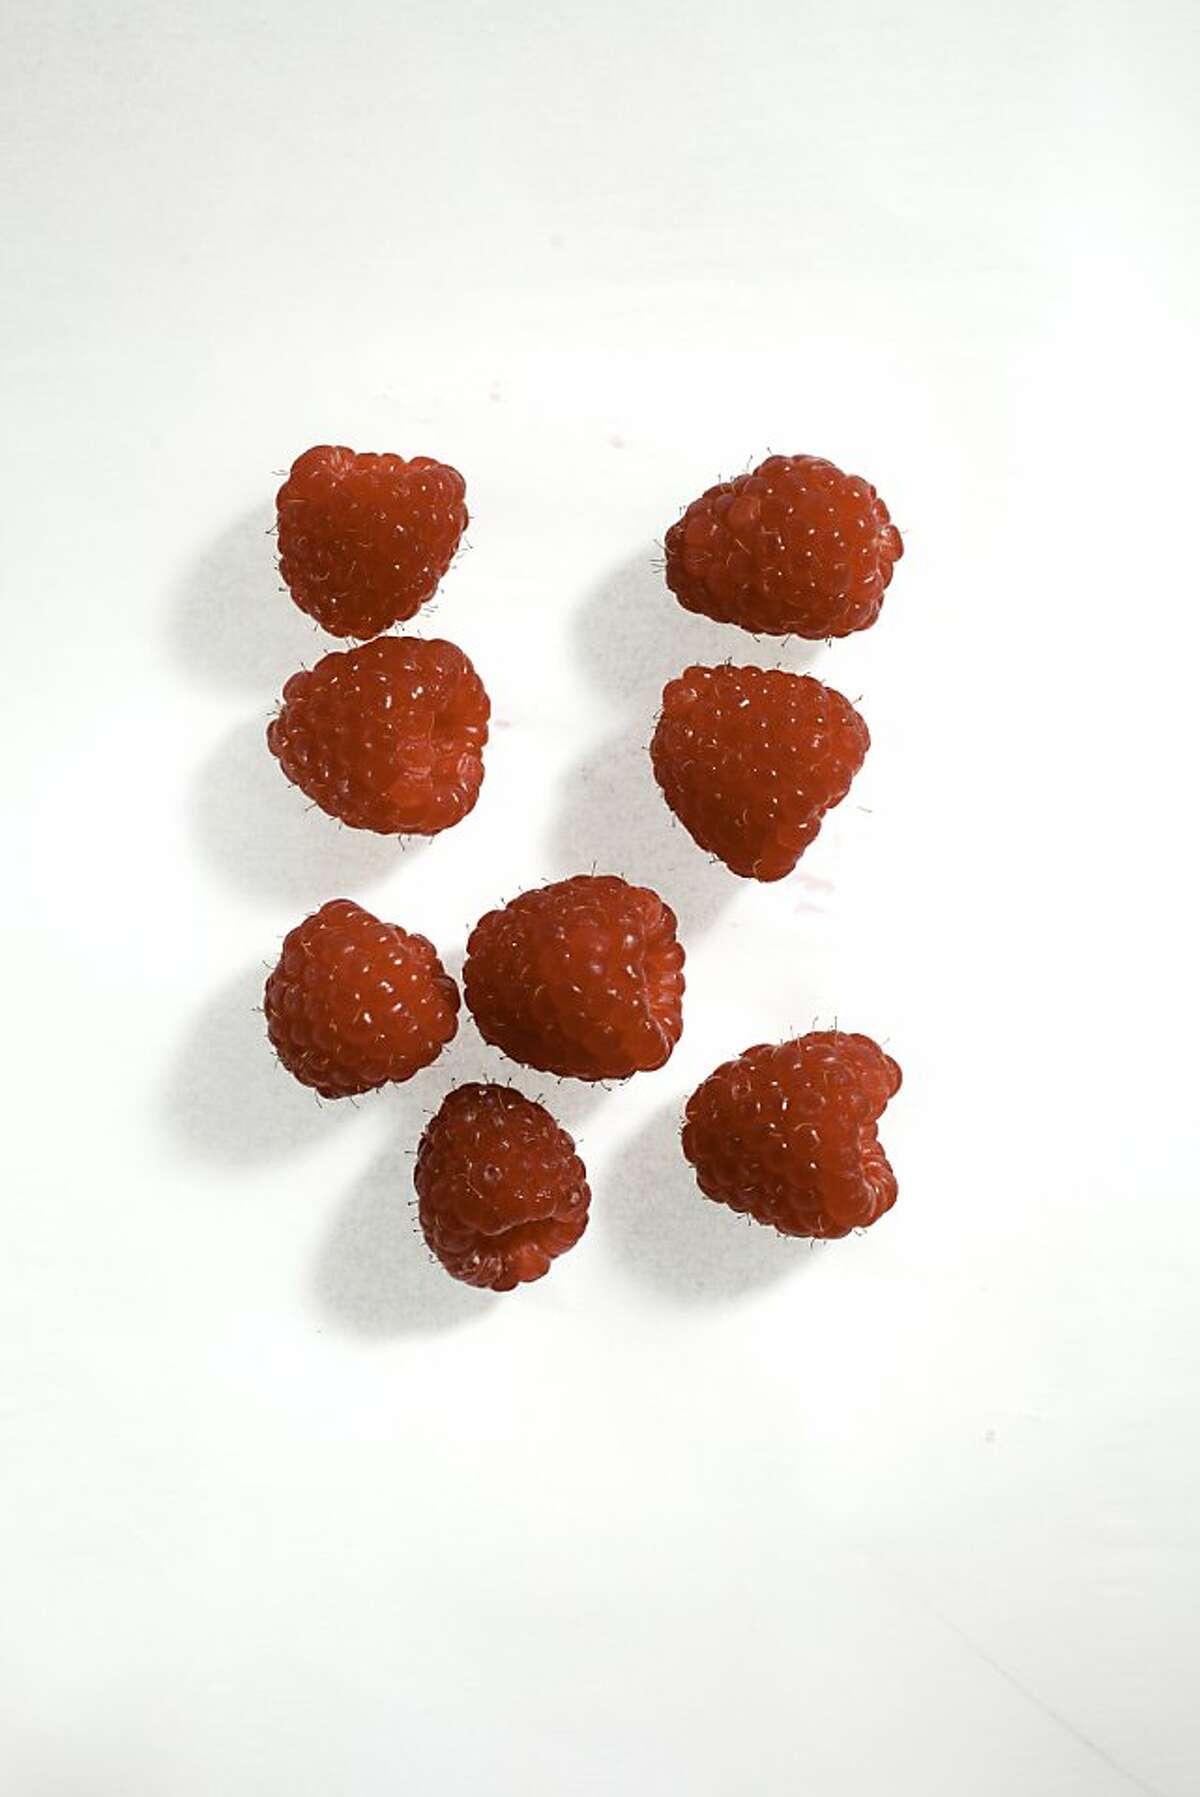 Raspberries as seen in San Francisco, California, Wednesday, July 25, 2012.